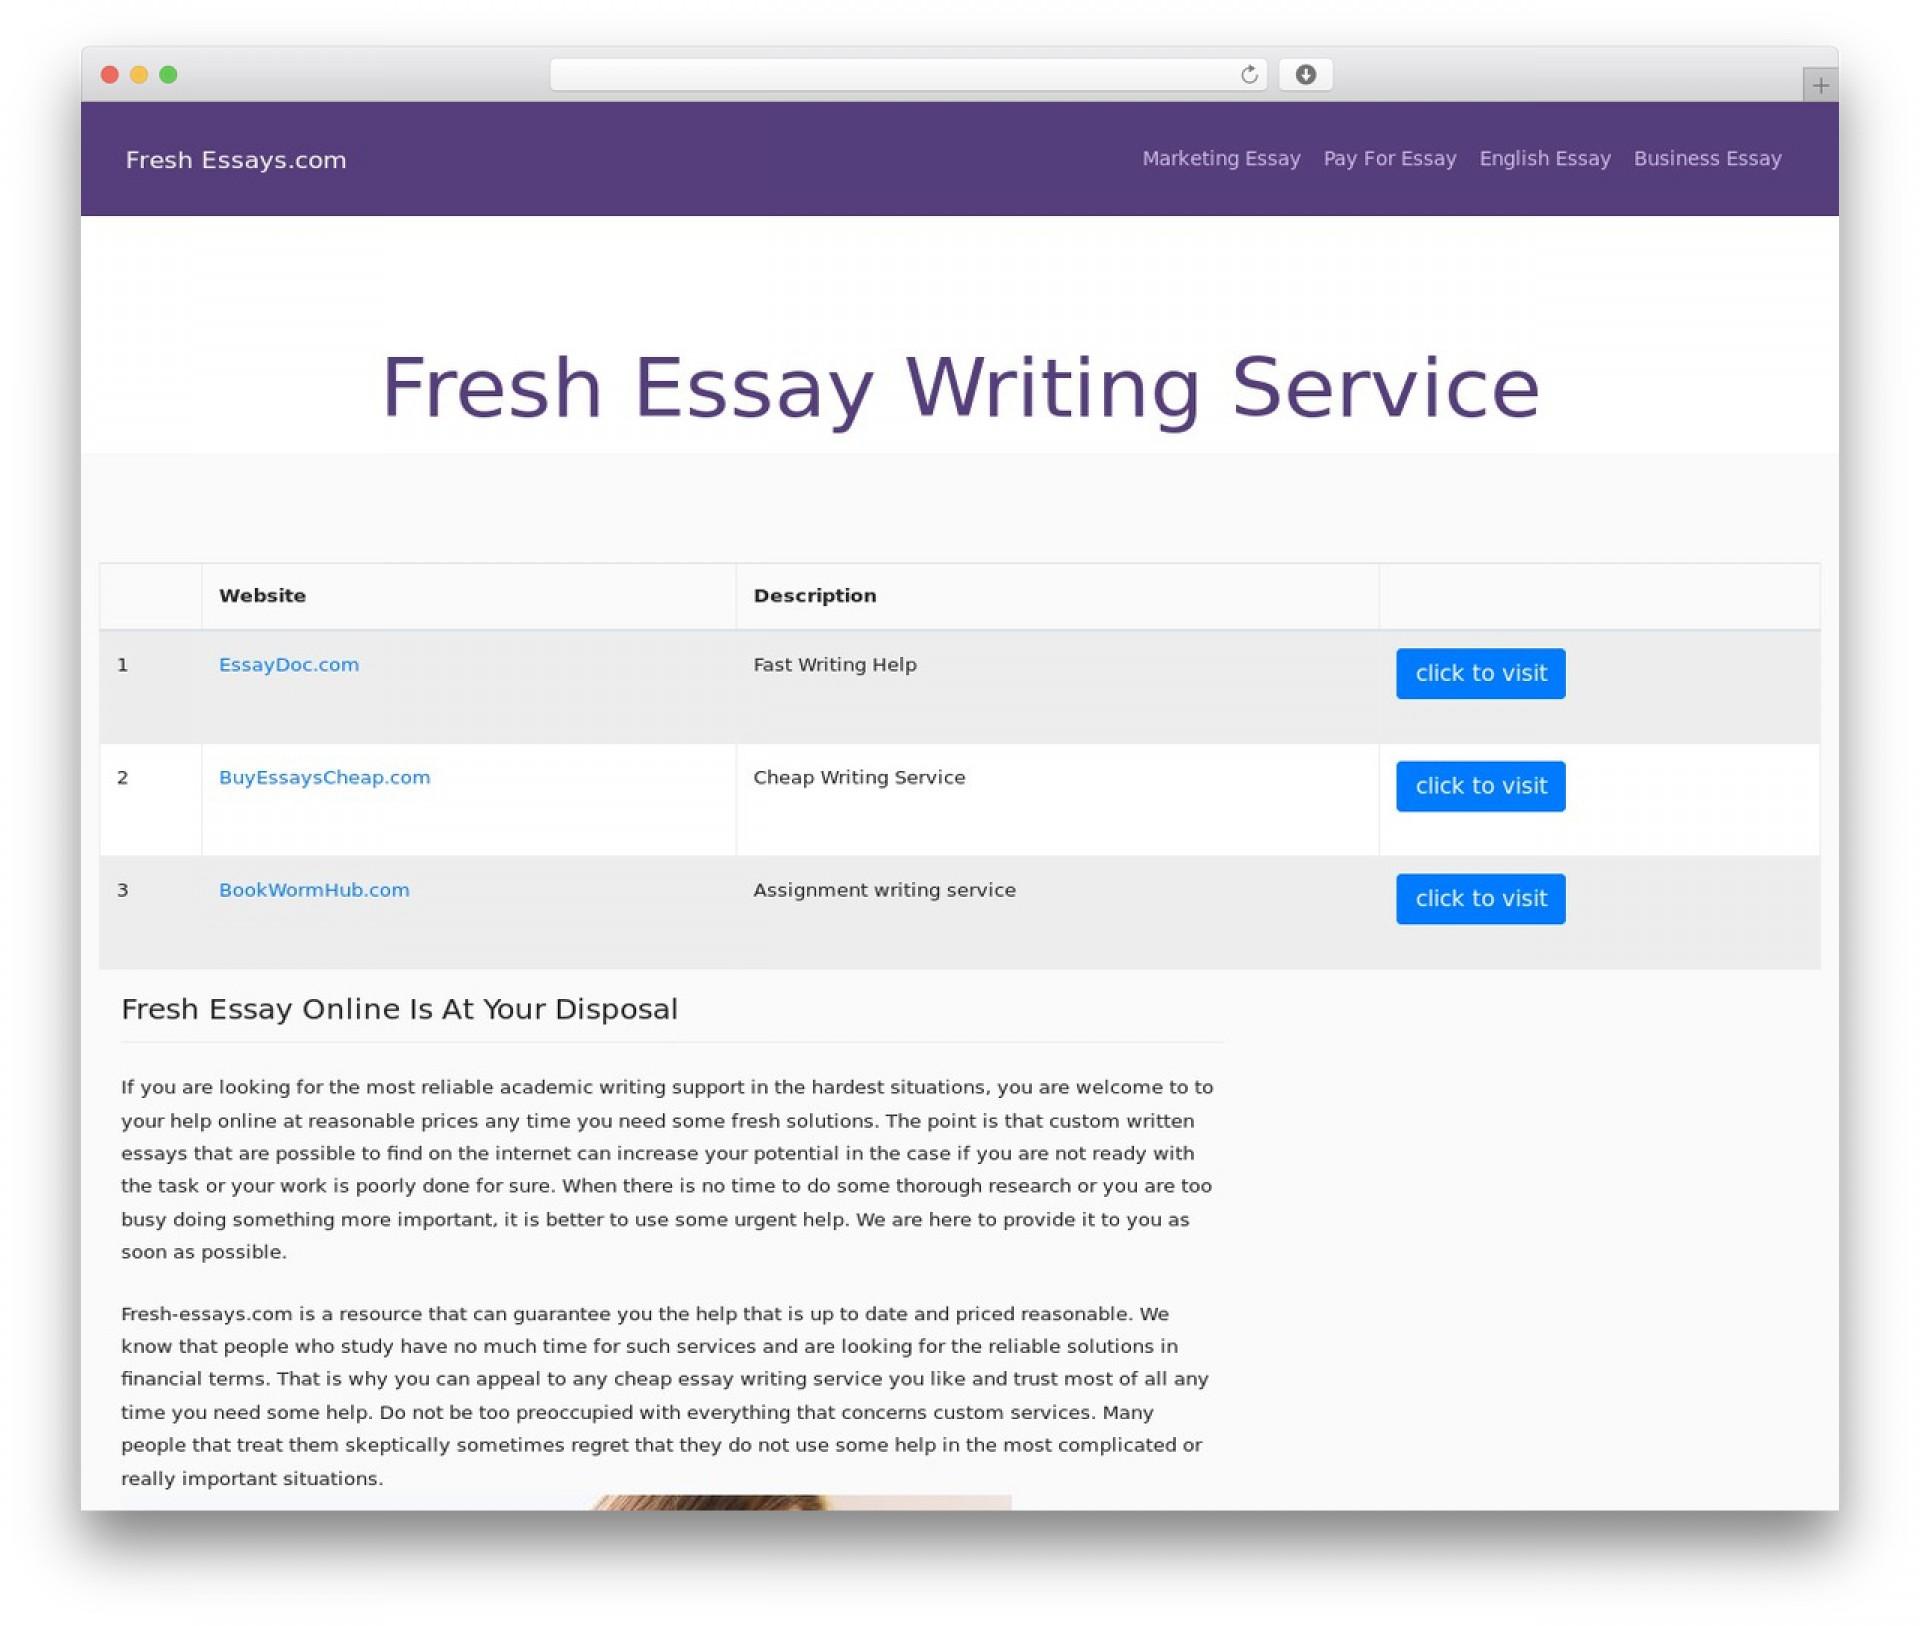 010 Material Design Wp Best Free Wordpress Theme 7cr4 O Fresh Essays Essay Wondrous Contact Uk 1920